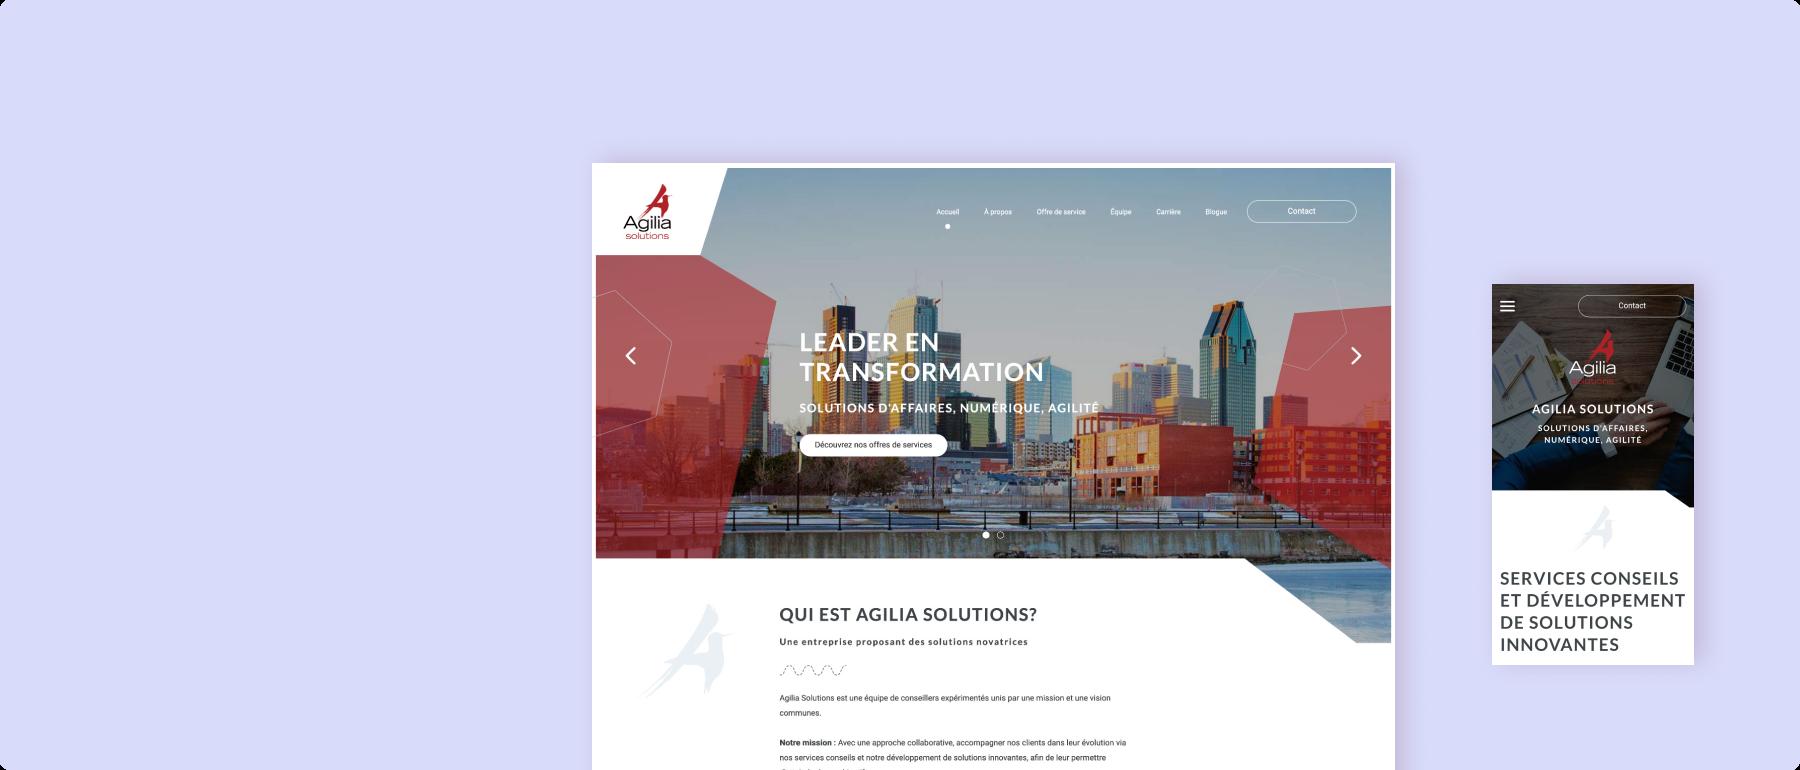 Agilia solutions